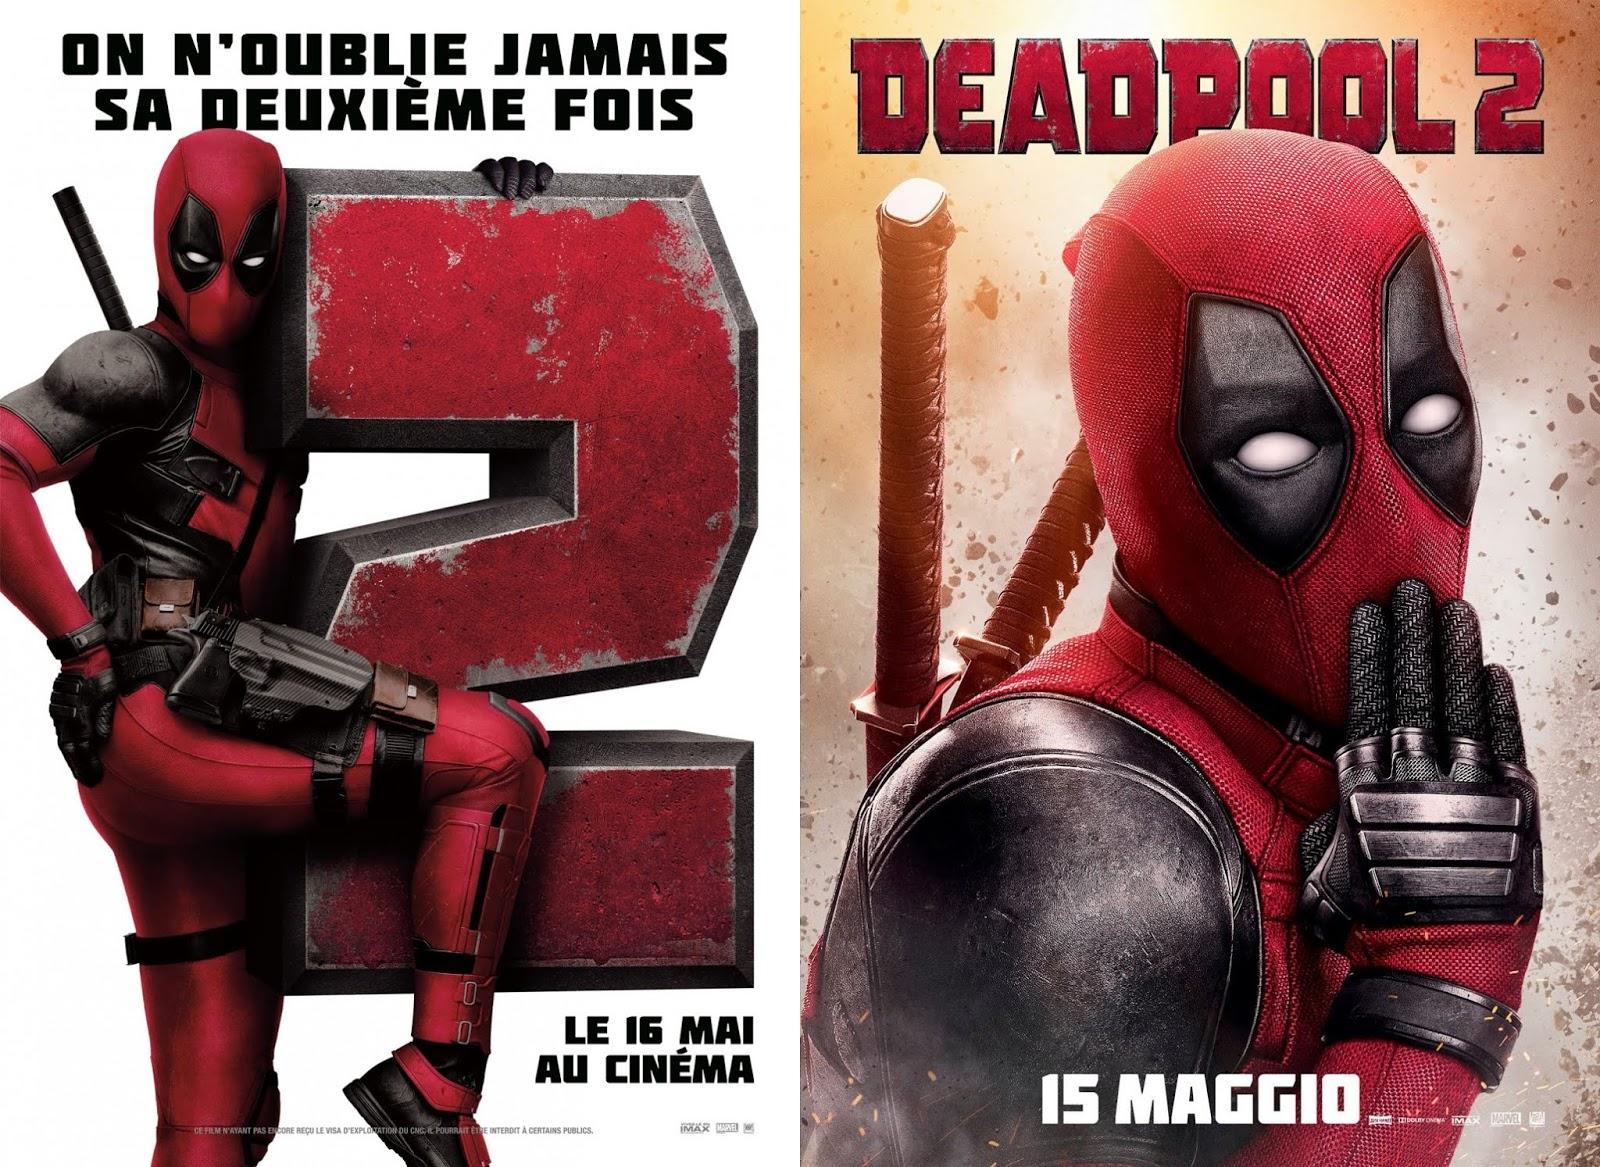 The Blot Says Deadpool 2 International Movie Posters